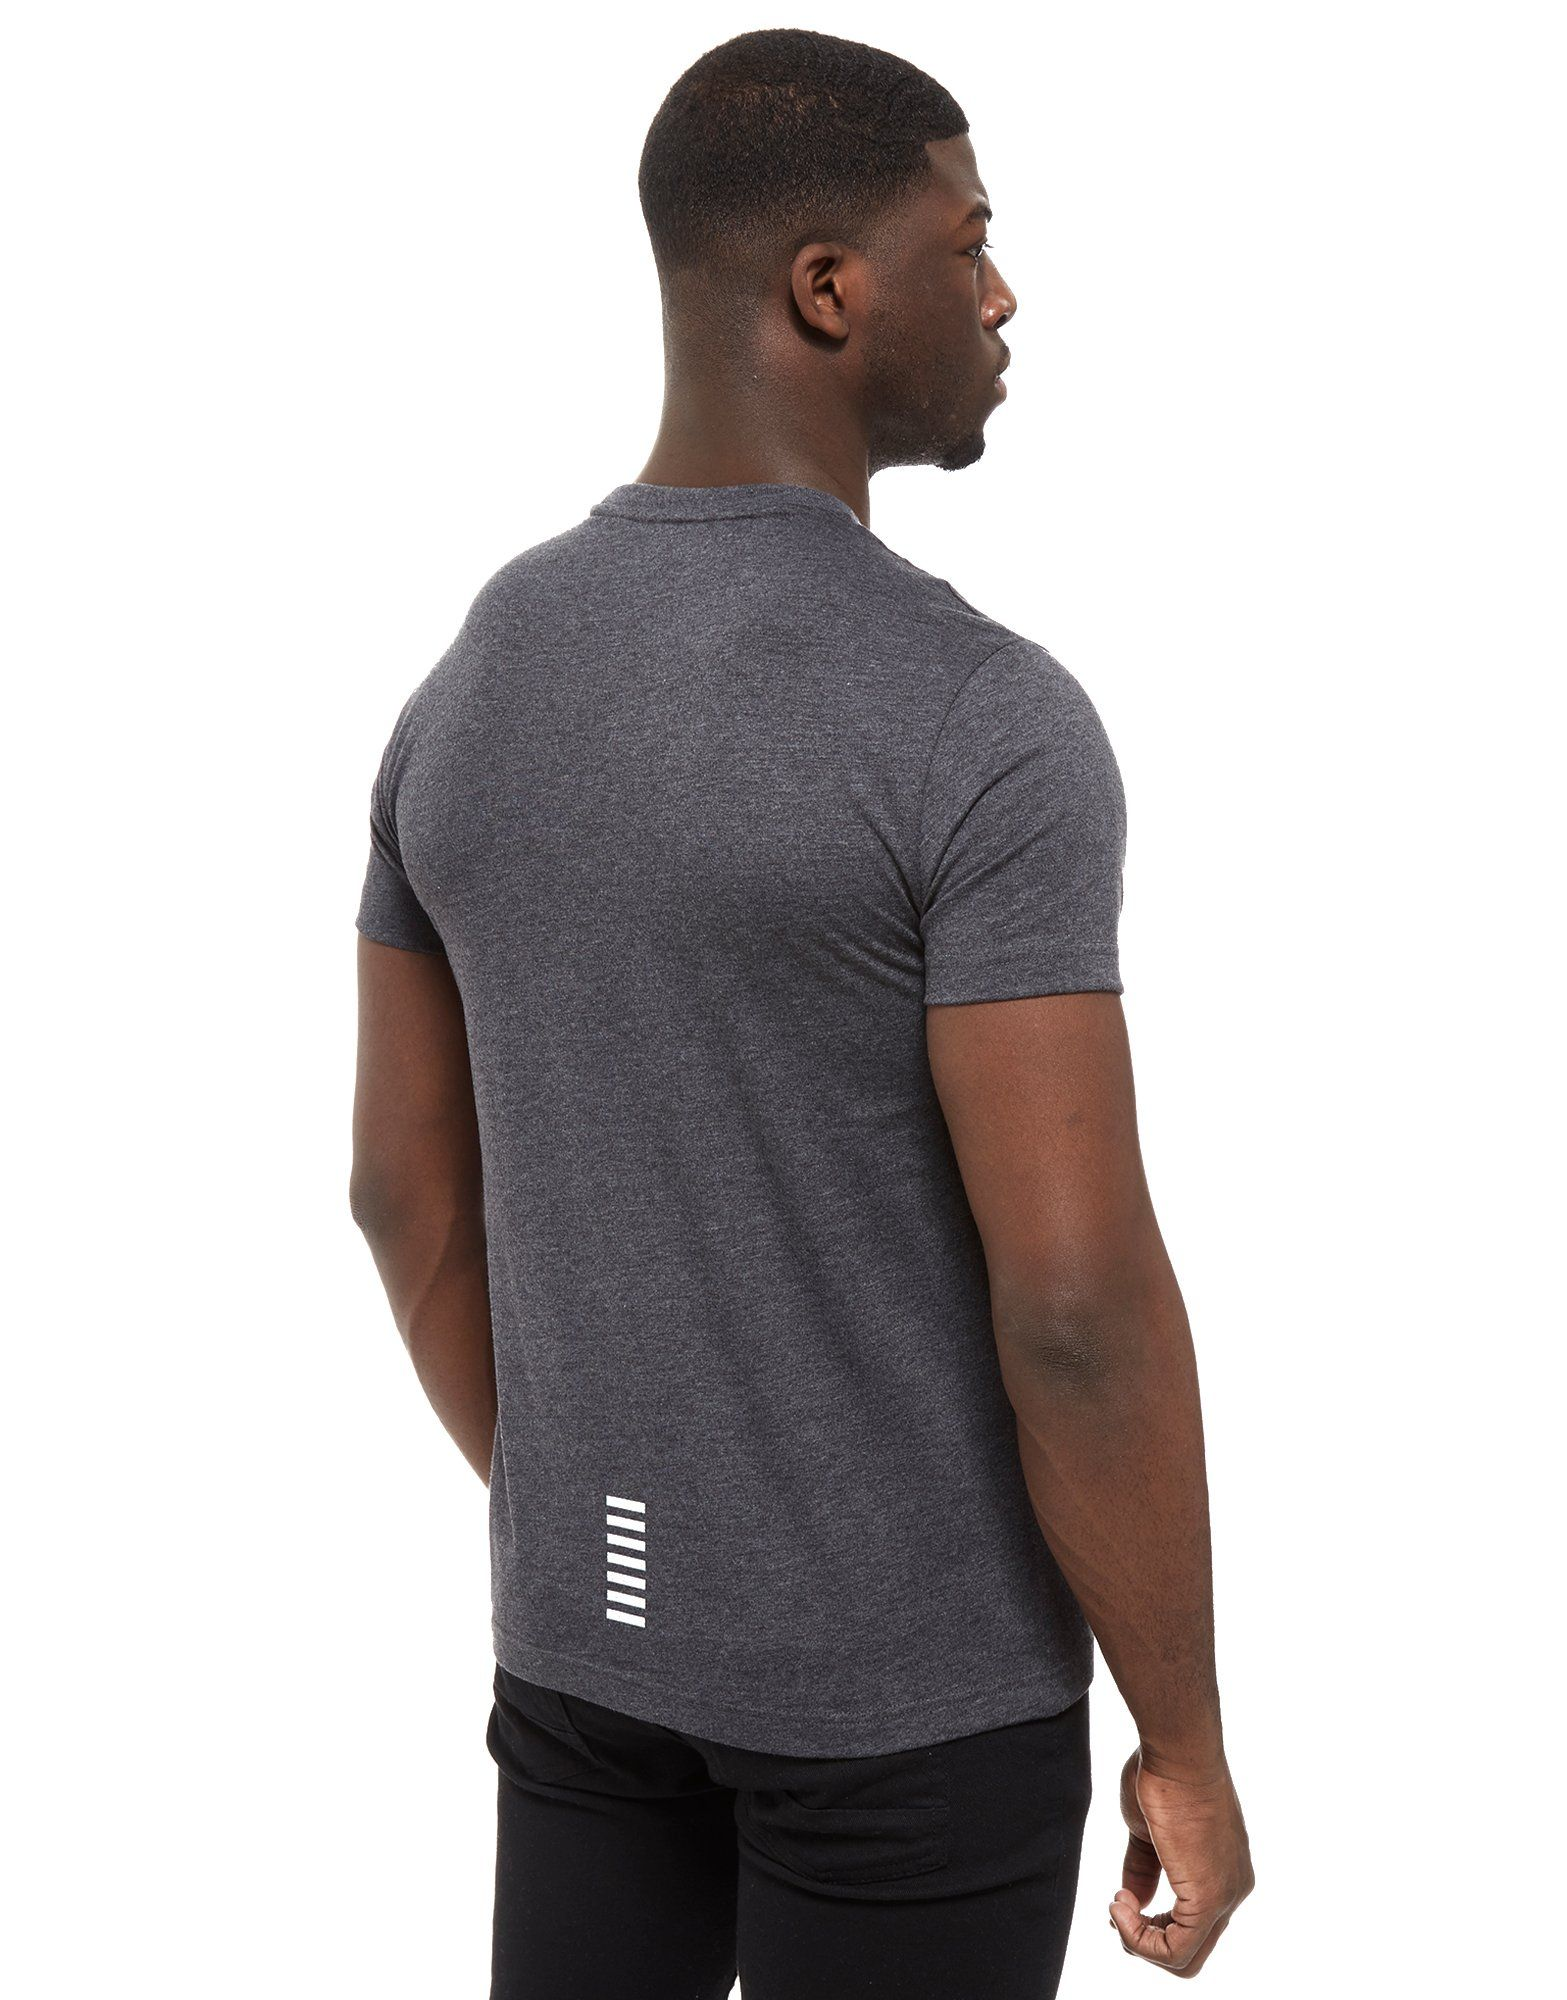 Emporio Armani EA7 Core Crew Neck Kurzarm T-Shirt Kohle Grau